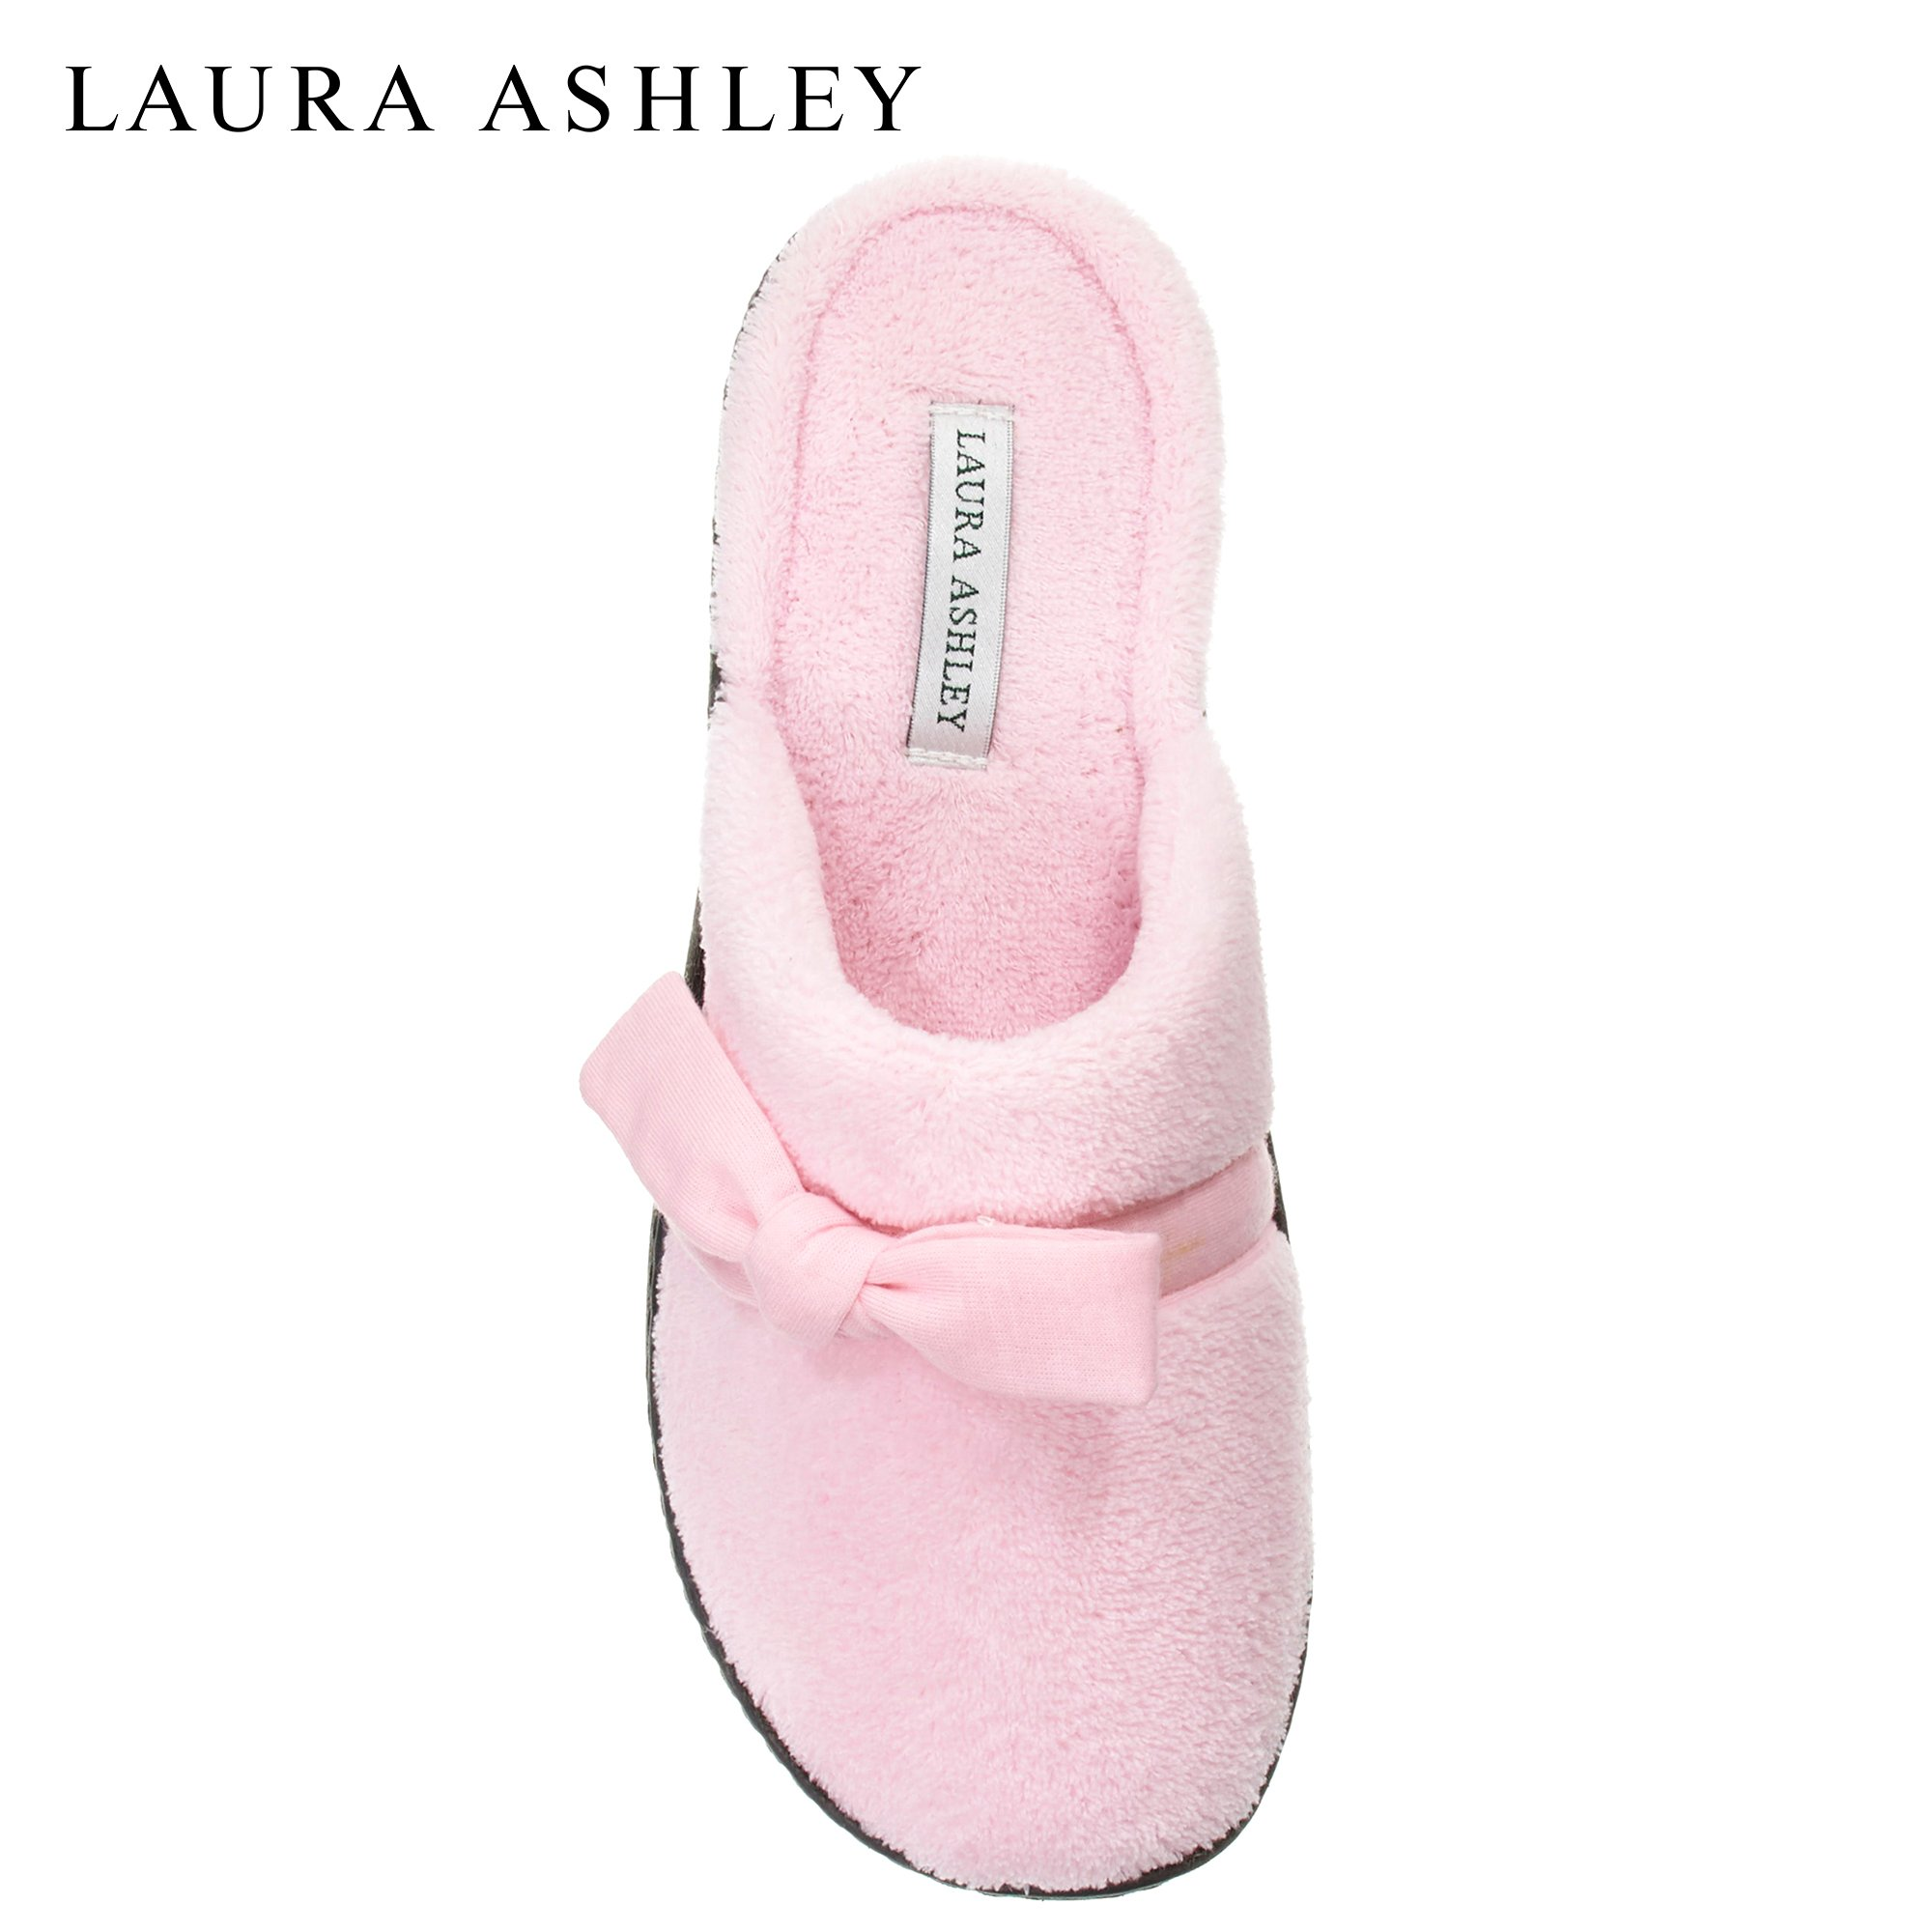 Laura Ashley Womens Rugged Memory Foam Bow Scuff Slippers Pale Pink Medium